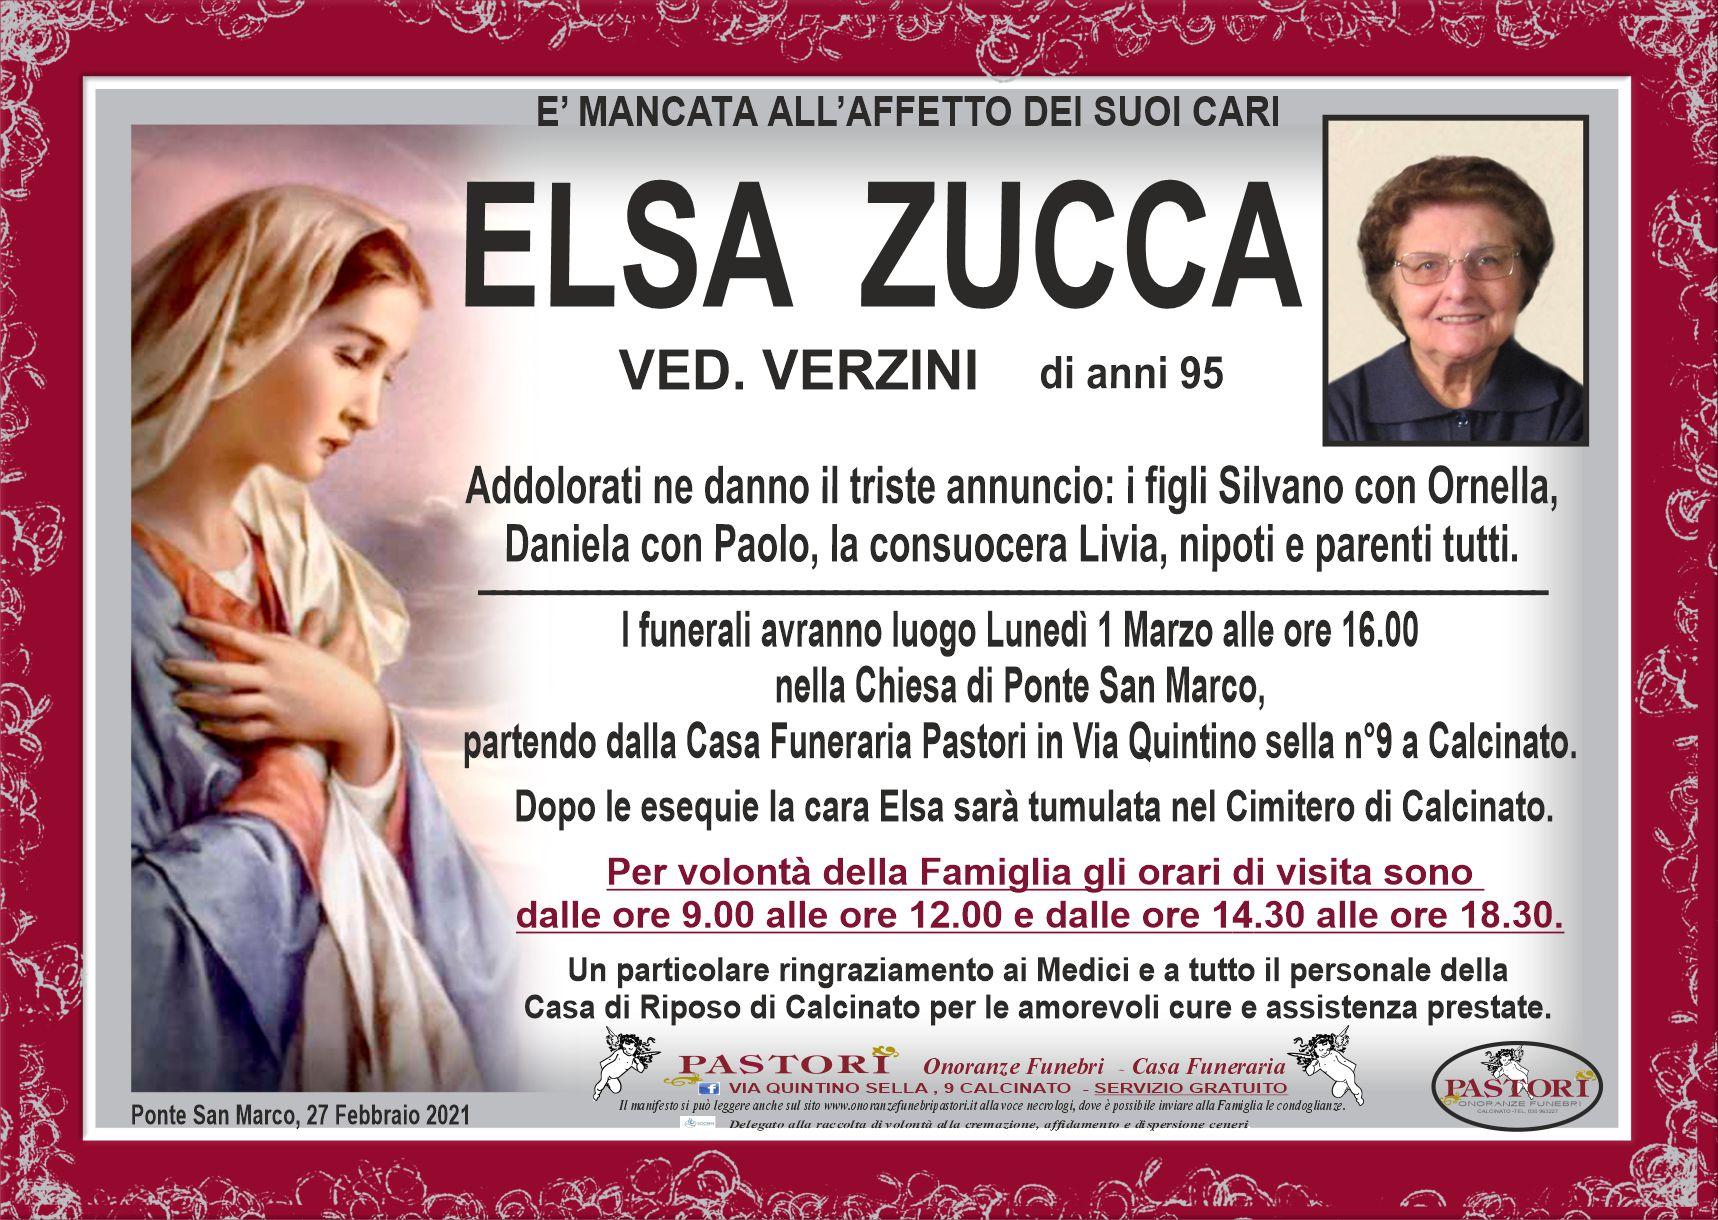 Elsa Zucca